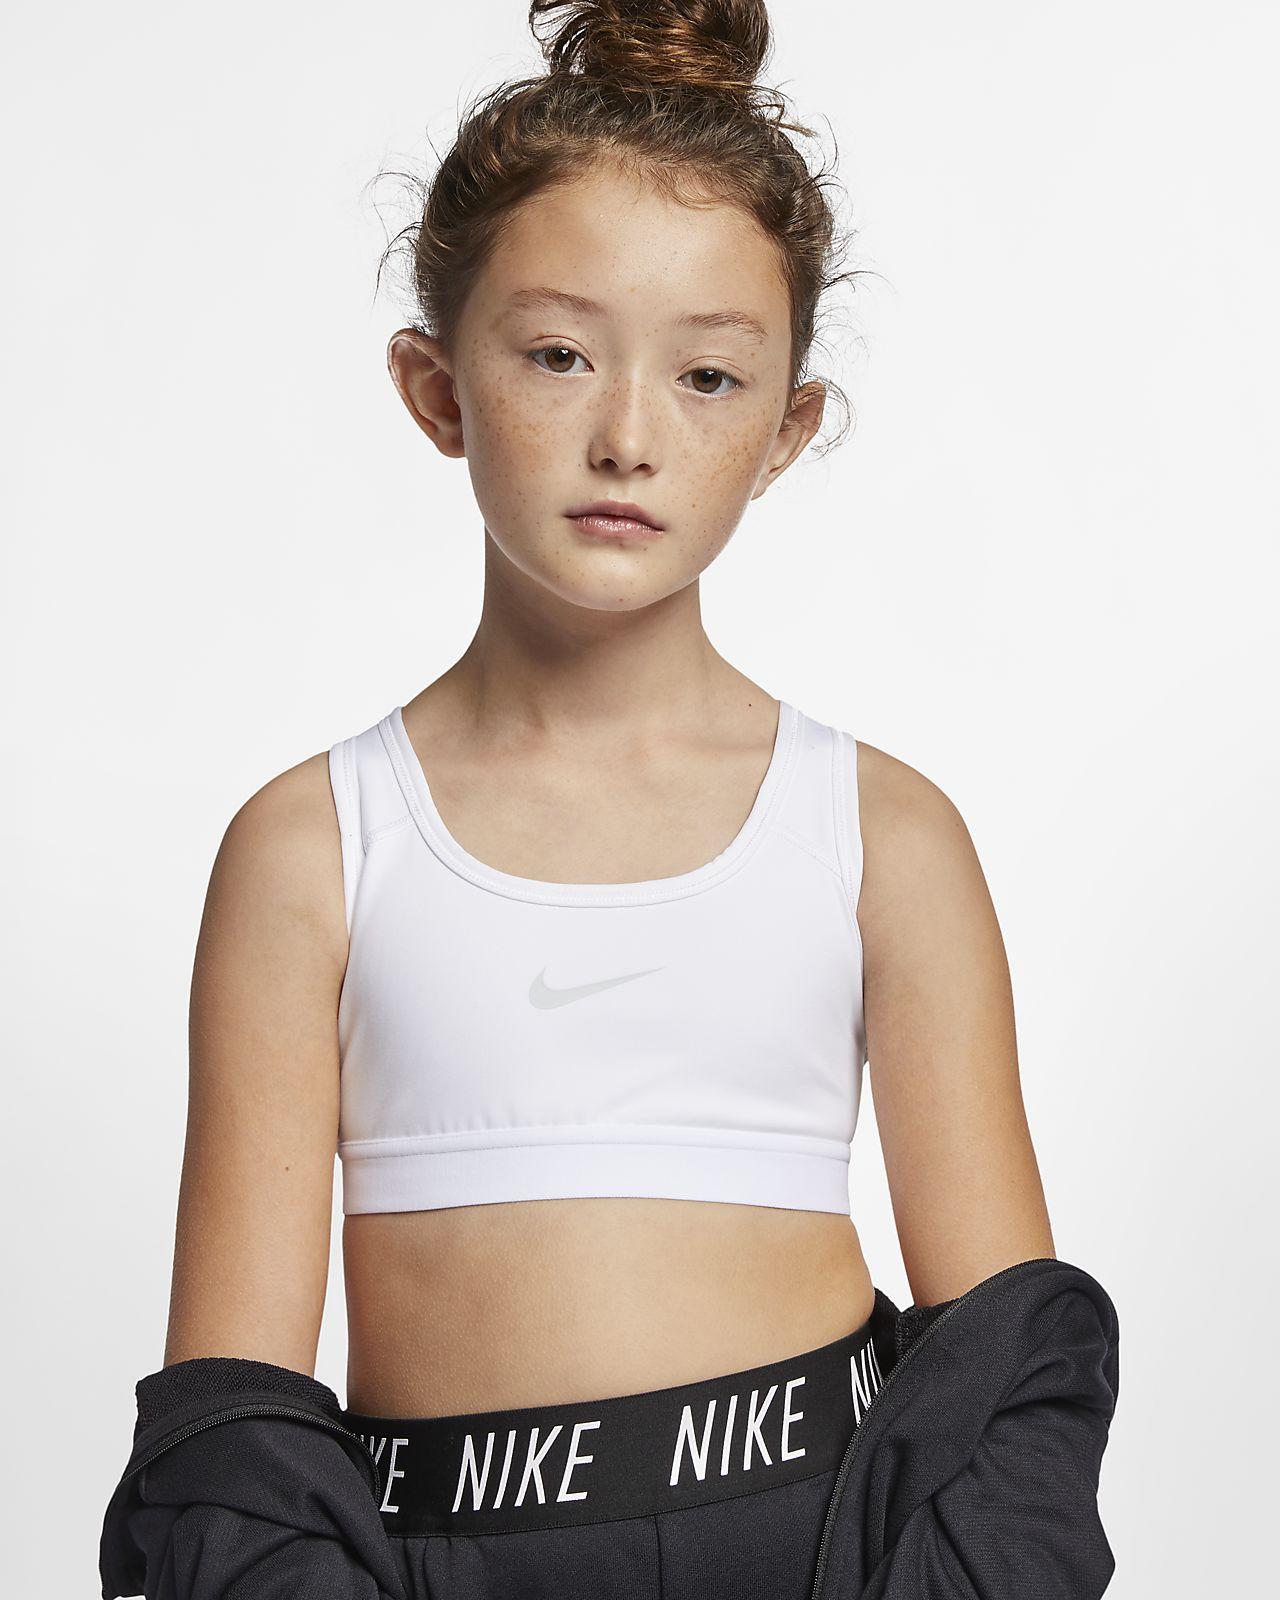 Nike Sport-bh voor meisjes